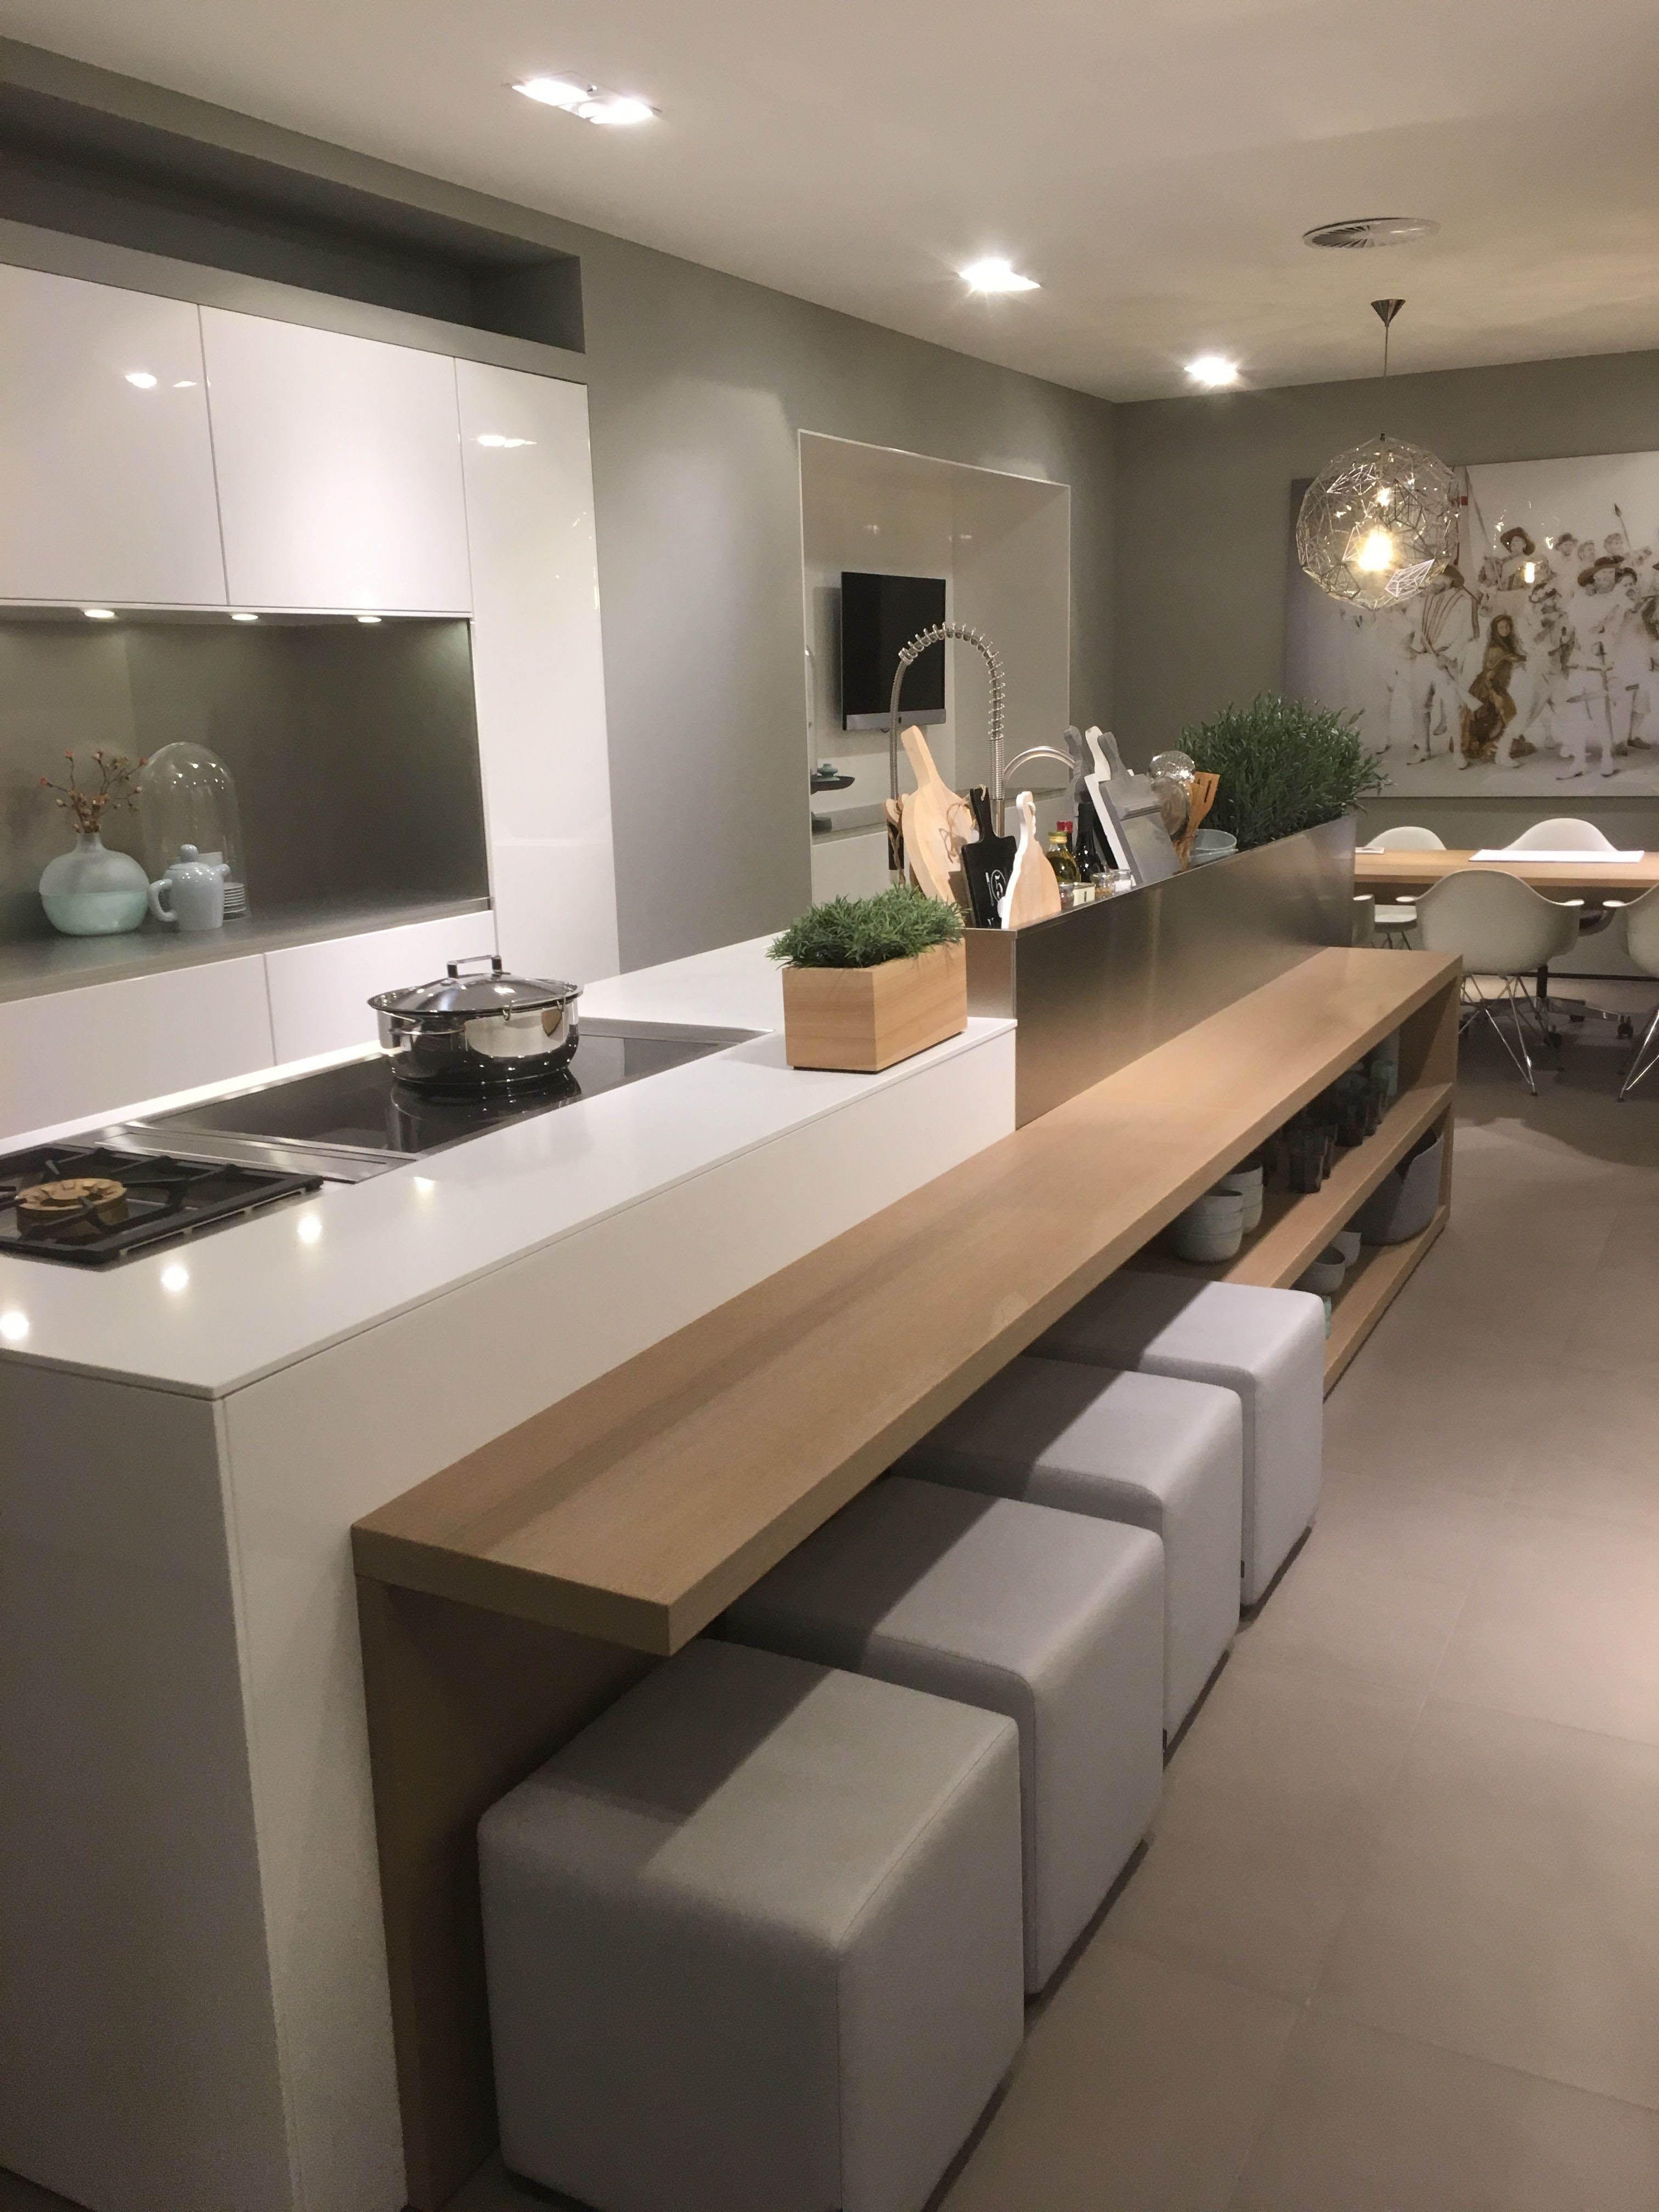 Modern Kitchen Area Style Ideas Contemporary Kitchen Interior Home Decor Kitchen Kitchen Design